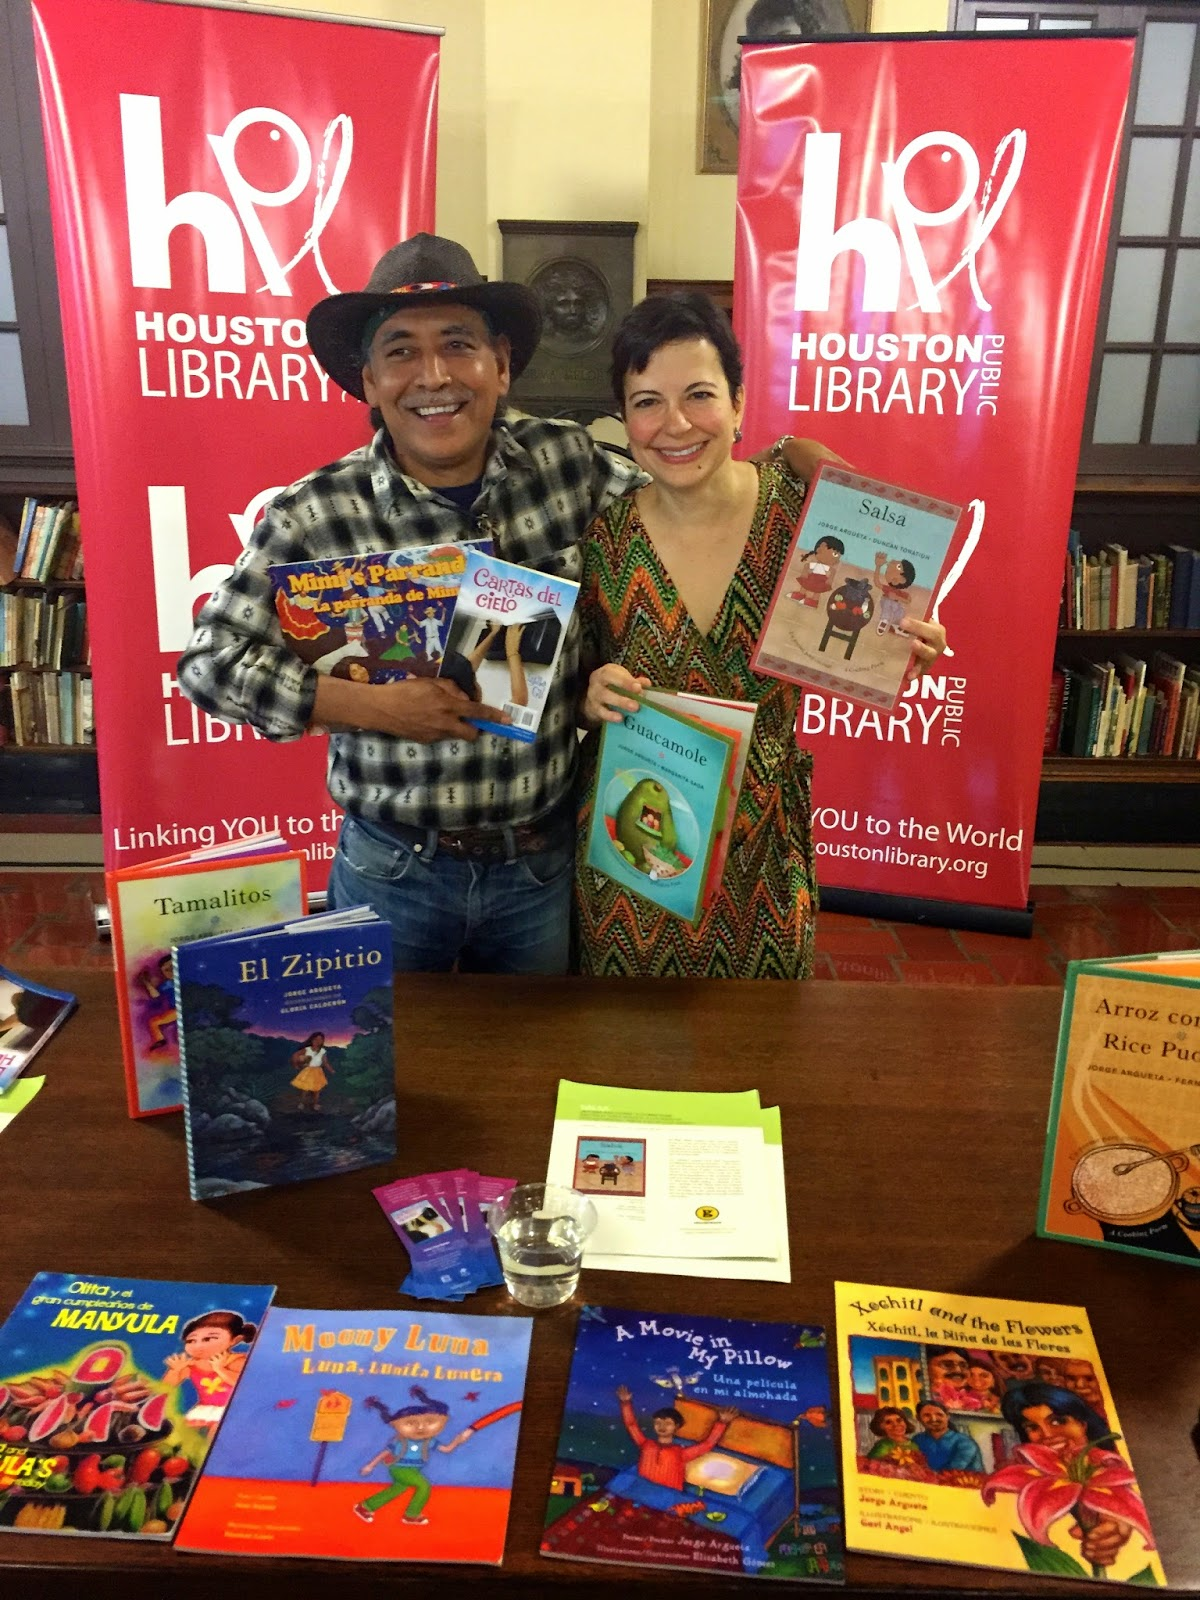 la bloga d iacute a in houston international latino book awards the international latino book awards setting a high cultural standard